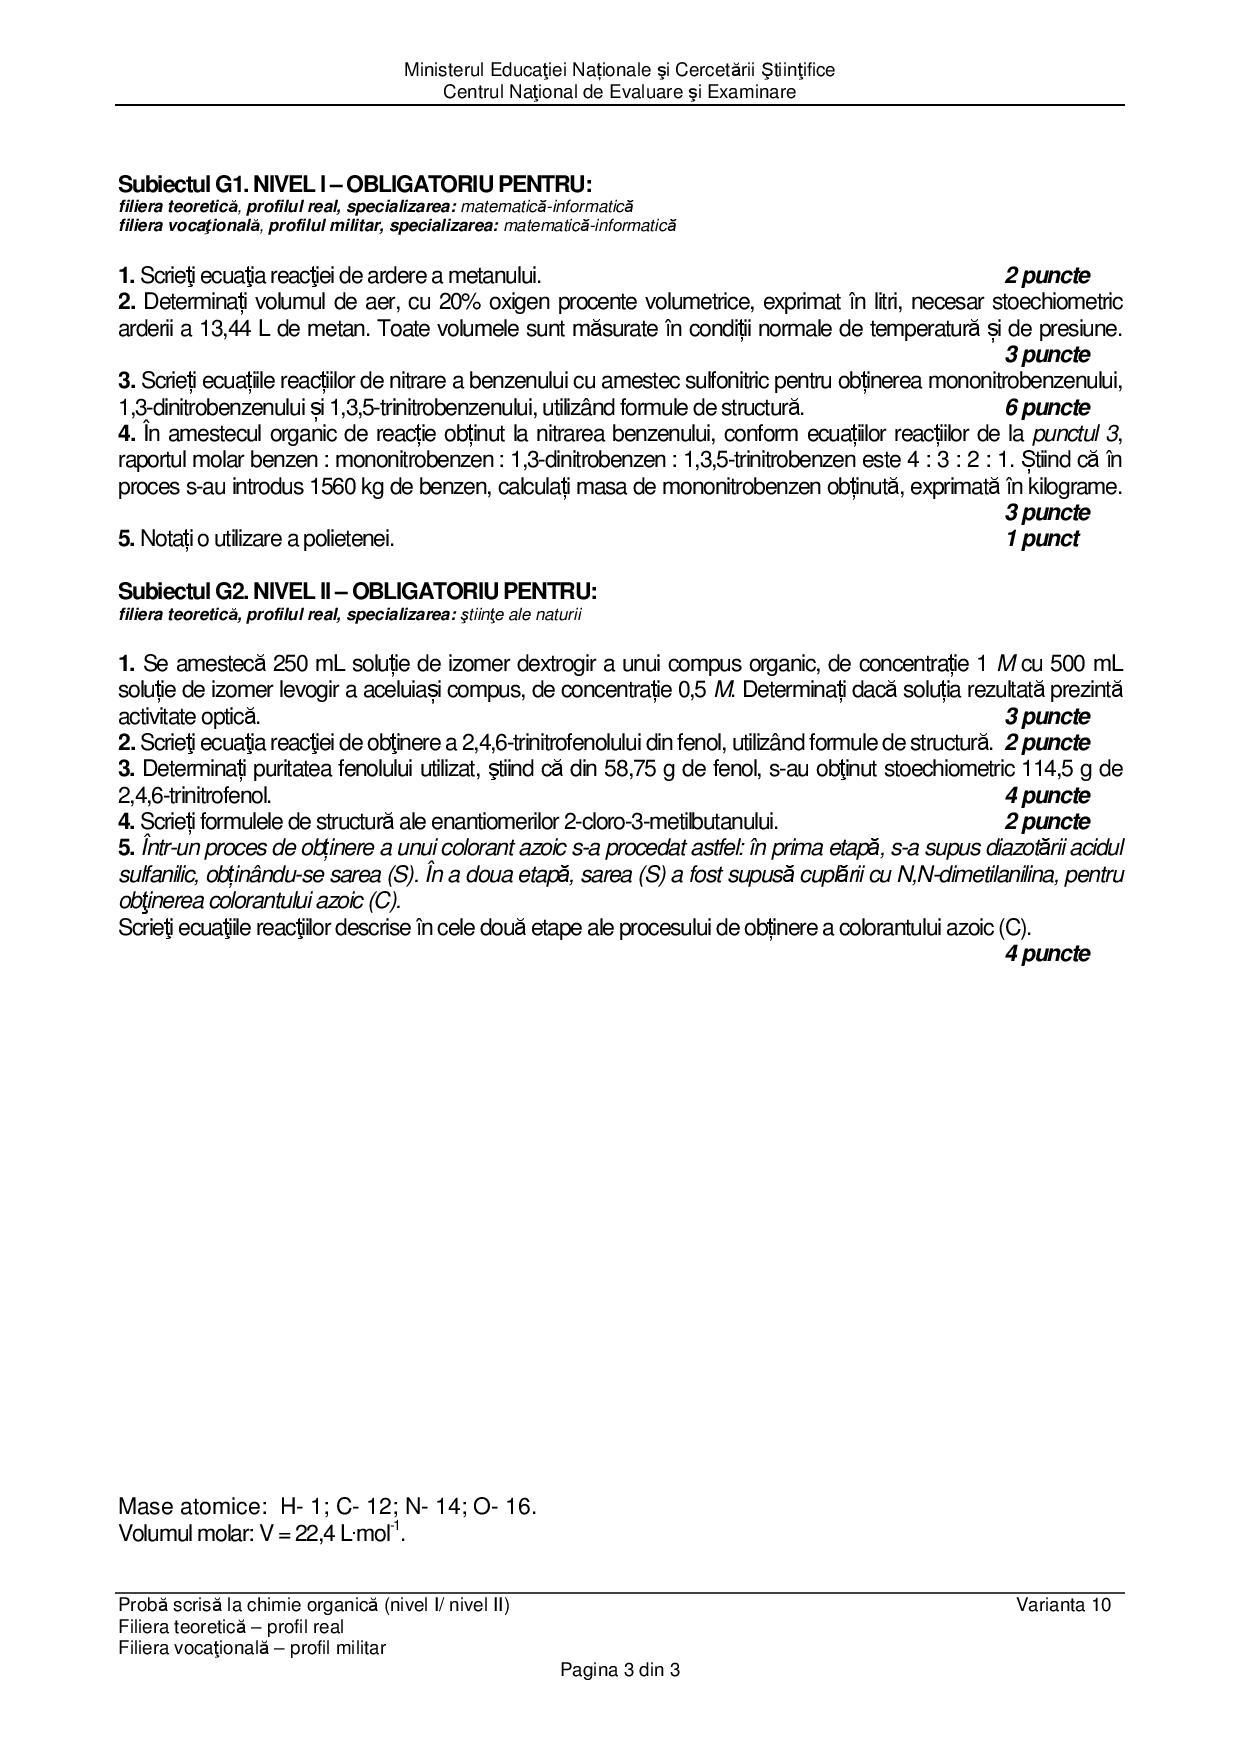 E_d_chimie_organica_niv_I_II_teoretic_2016_var_10_LRO-page-003